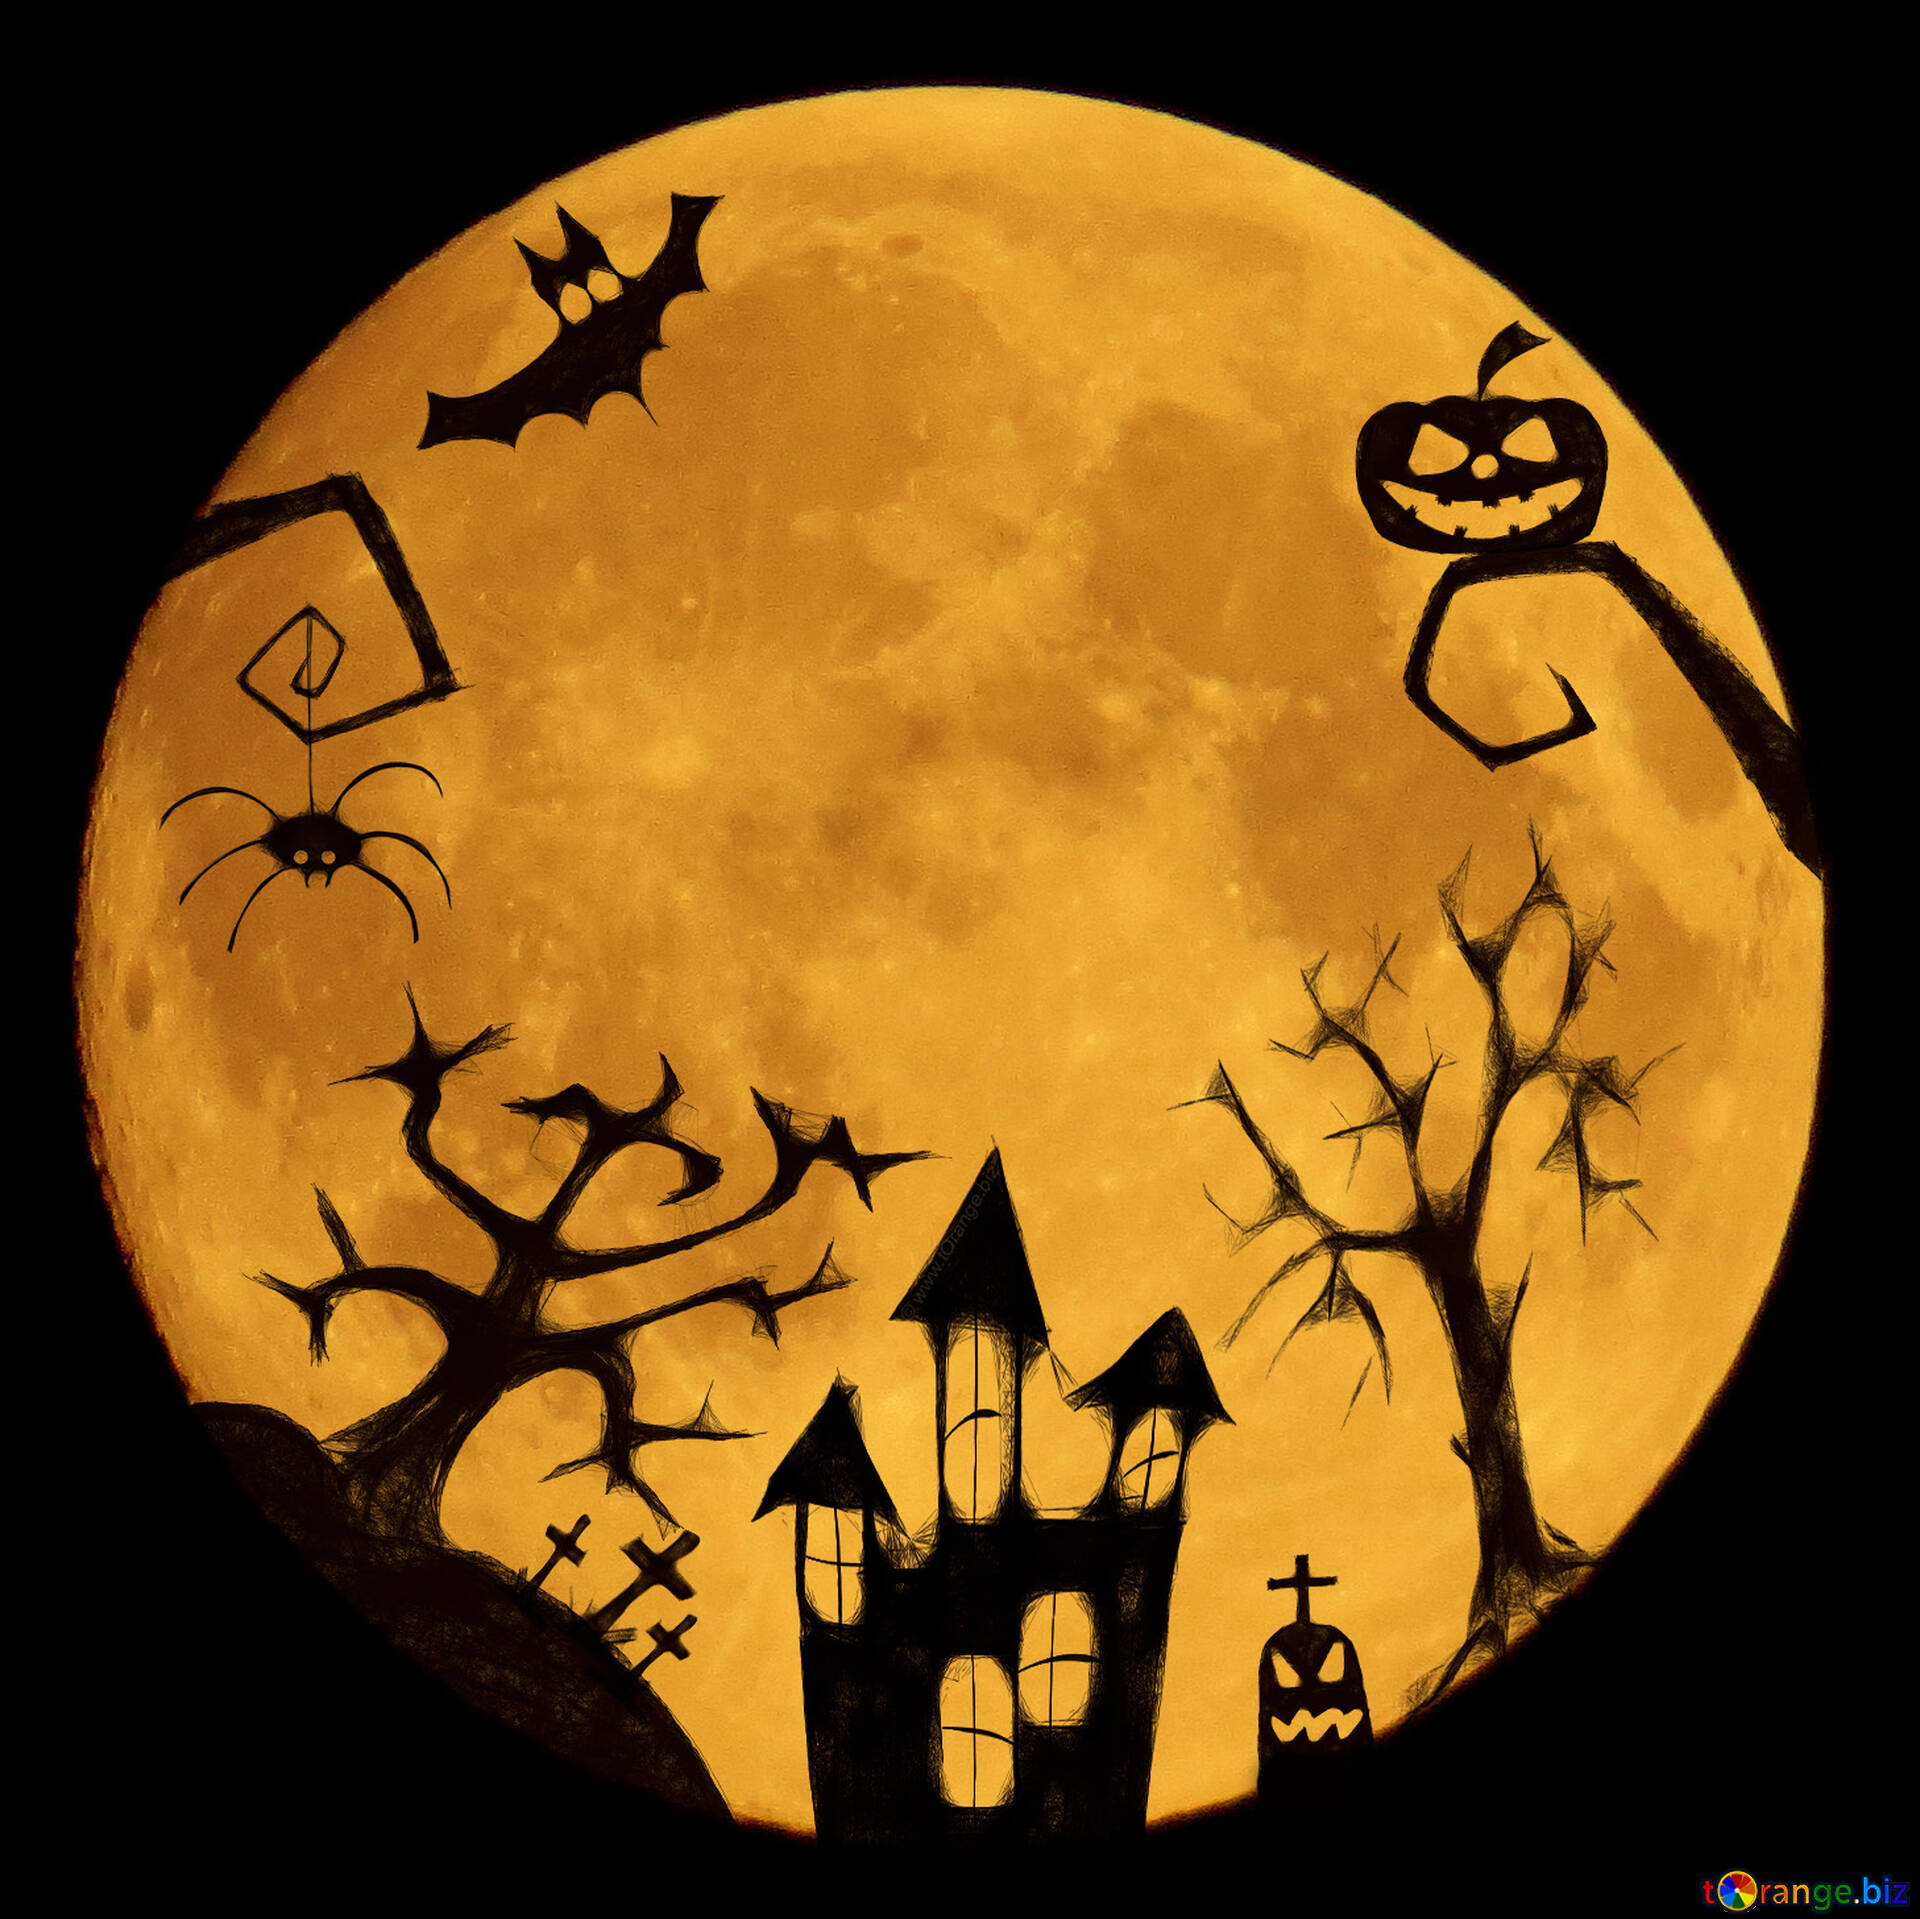 Happy Halloween Pumpkin Clipart | Clipart Panda - Free Clipart Images | Halloween  clipart, Halloween clipart free, Halloween pumpkins